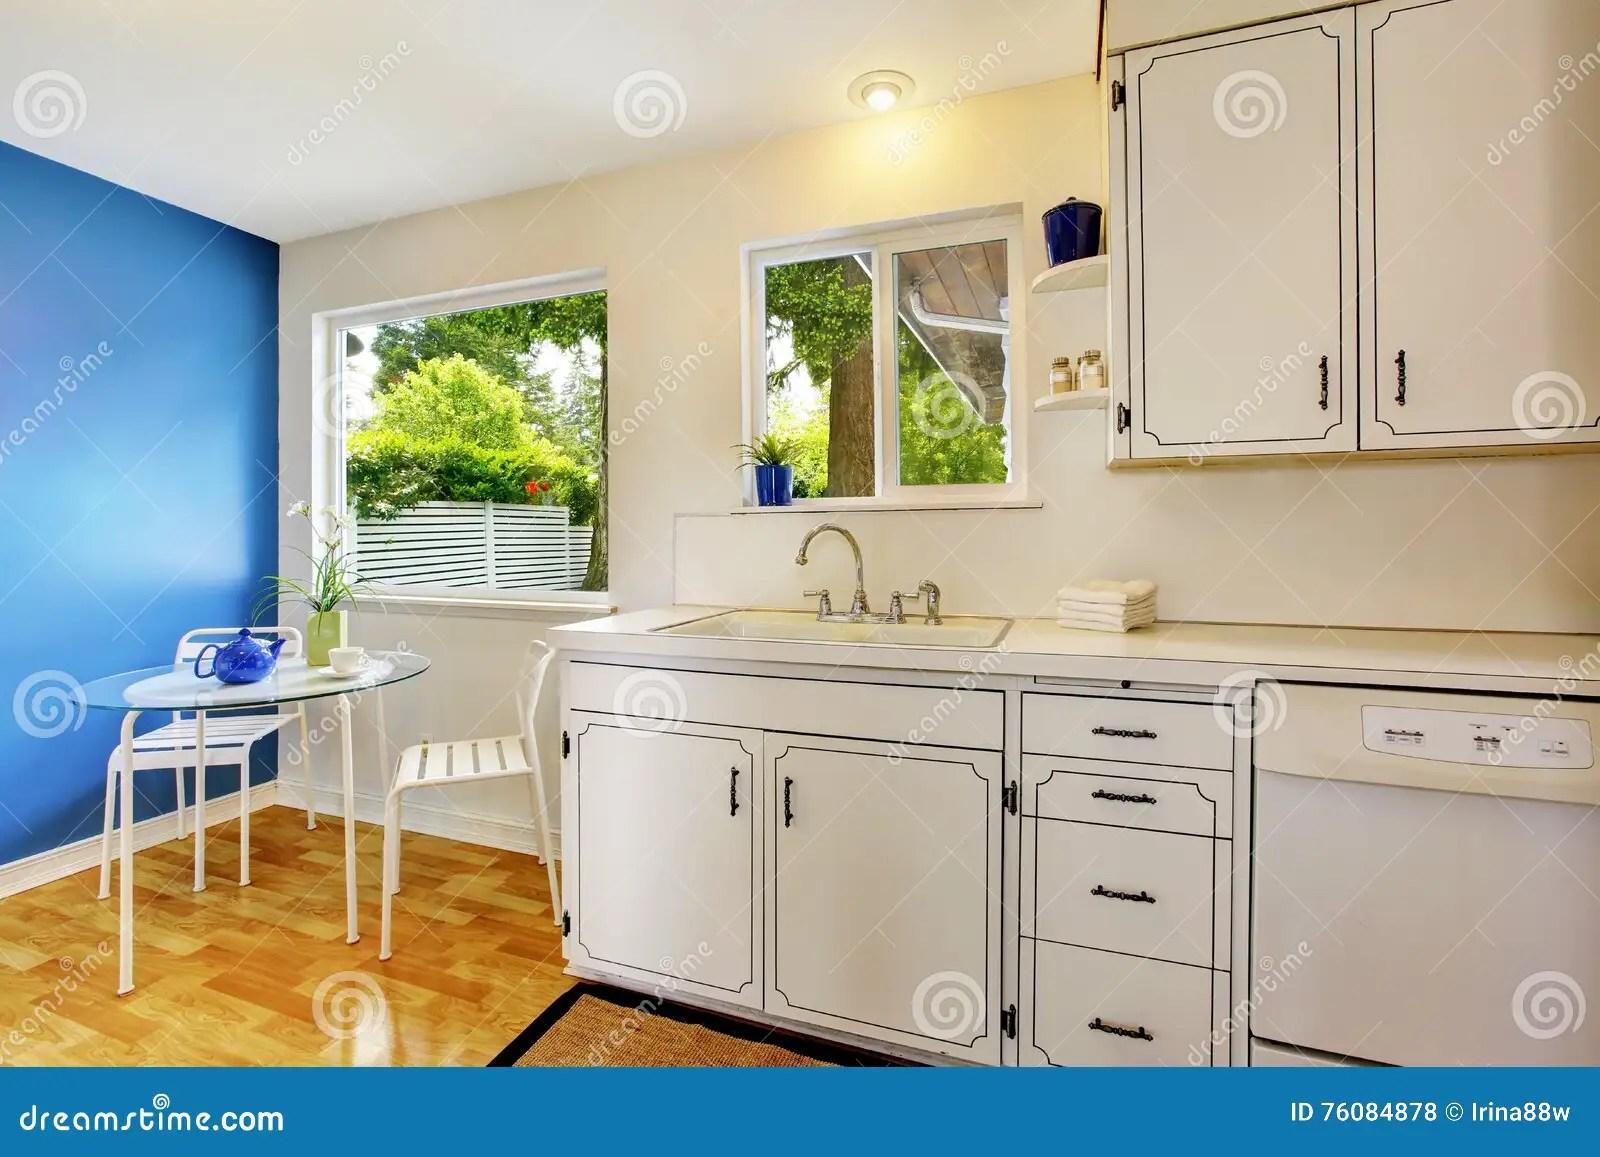 kitchen glass table remodel contractors 有白色内阁 蓝色能墙壁和的玻璃的厨房室库存照片 图片包括有平面 拱道 与白色内阁 蓝色墙壁和玻璃餐桌的小厨房室内部西北 美国